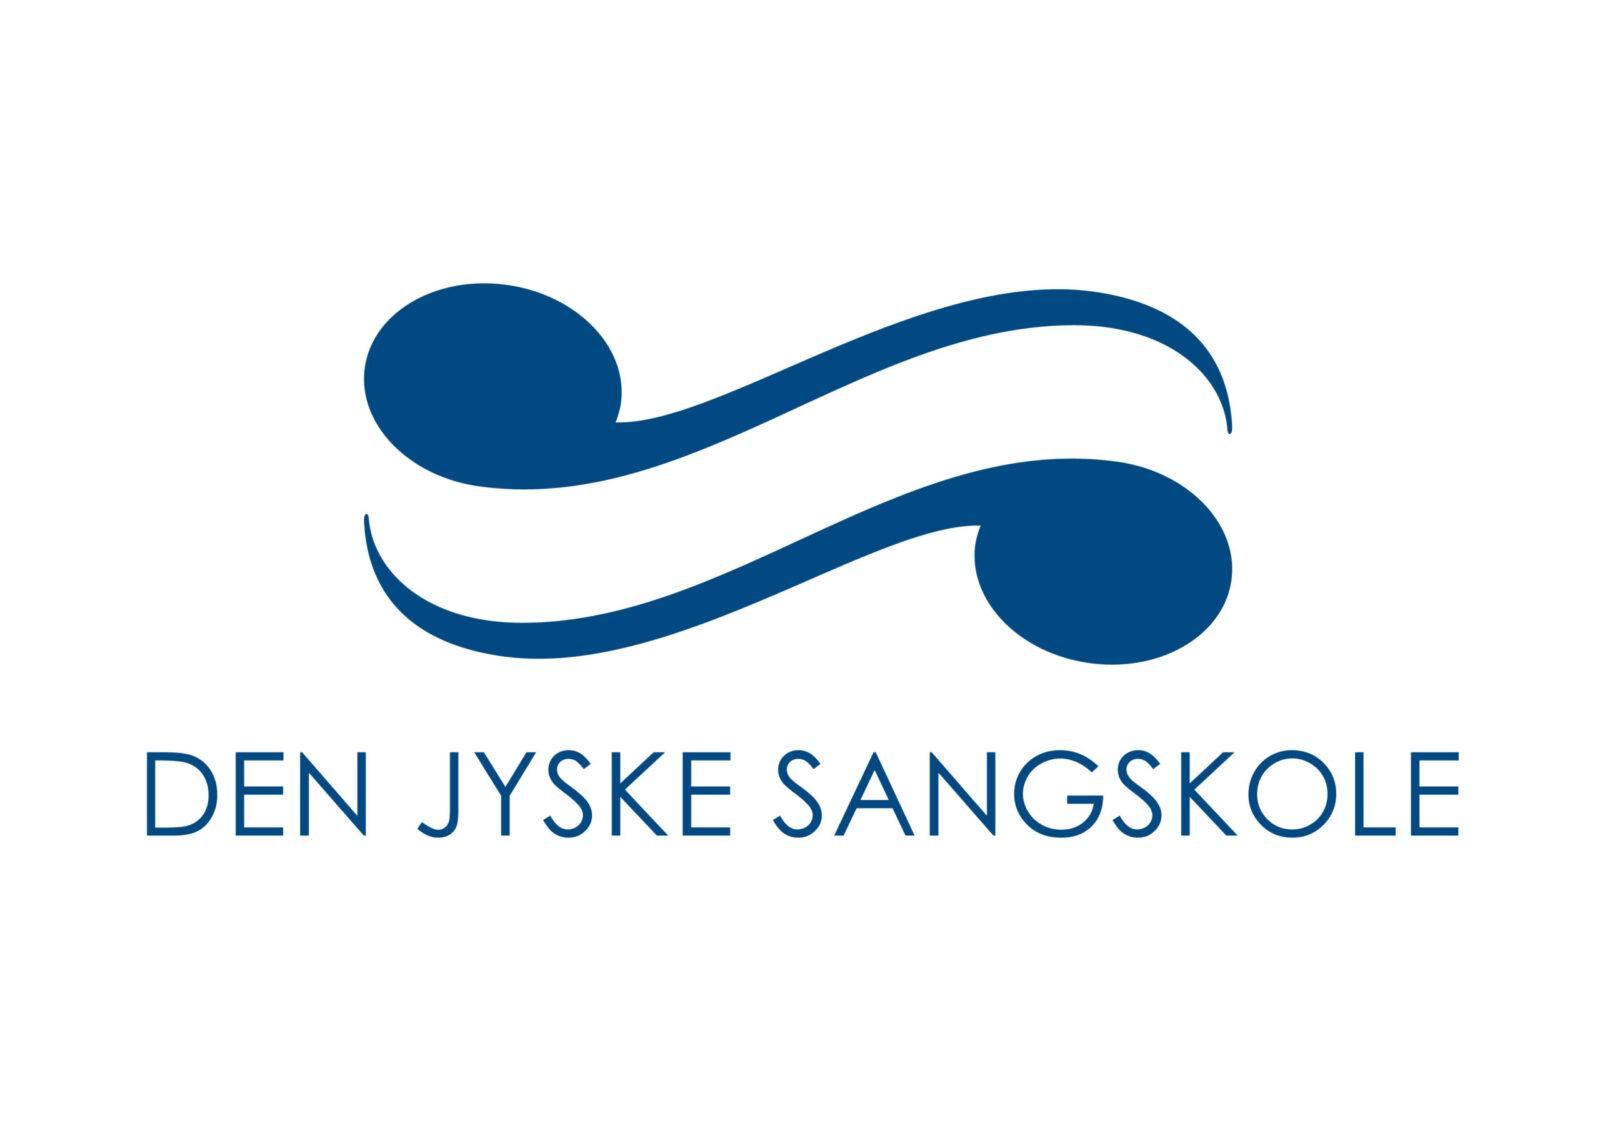 Den Jyske Sangskole logo